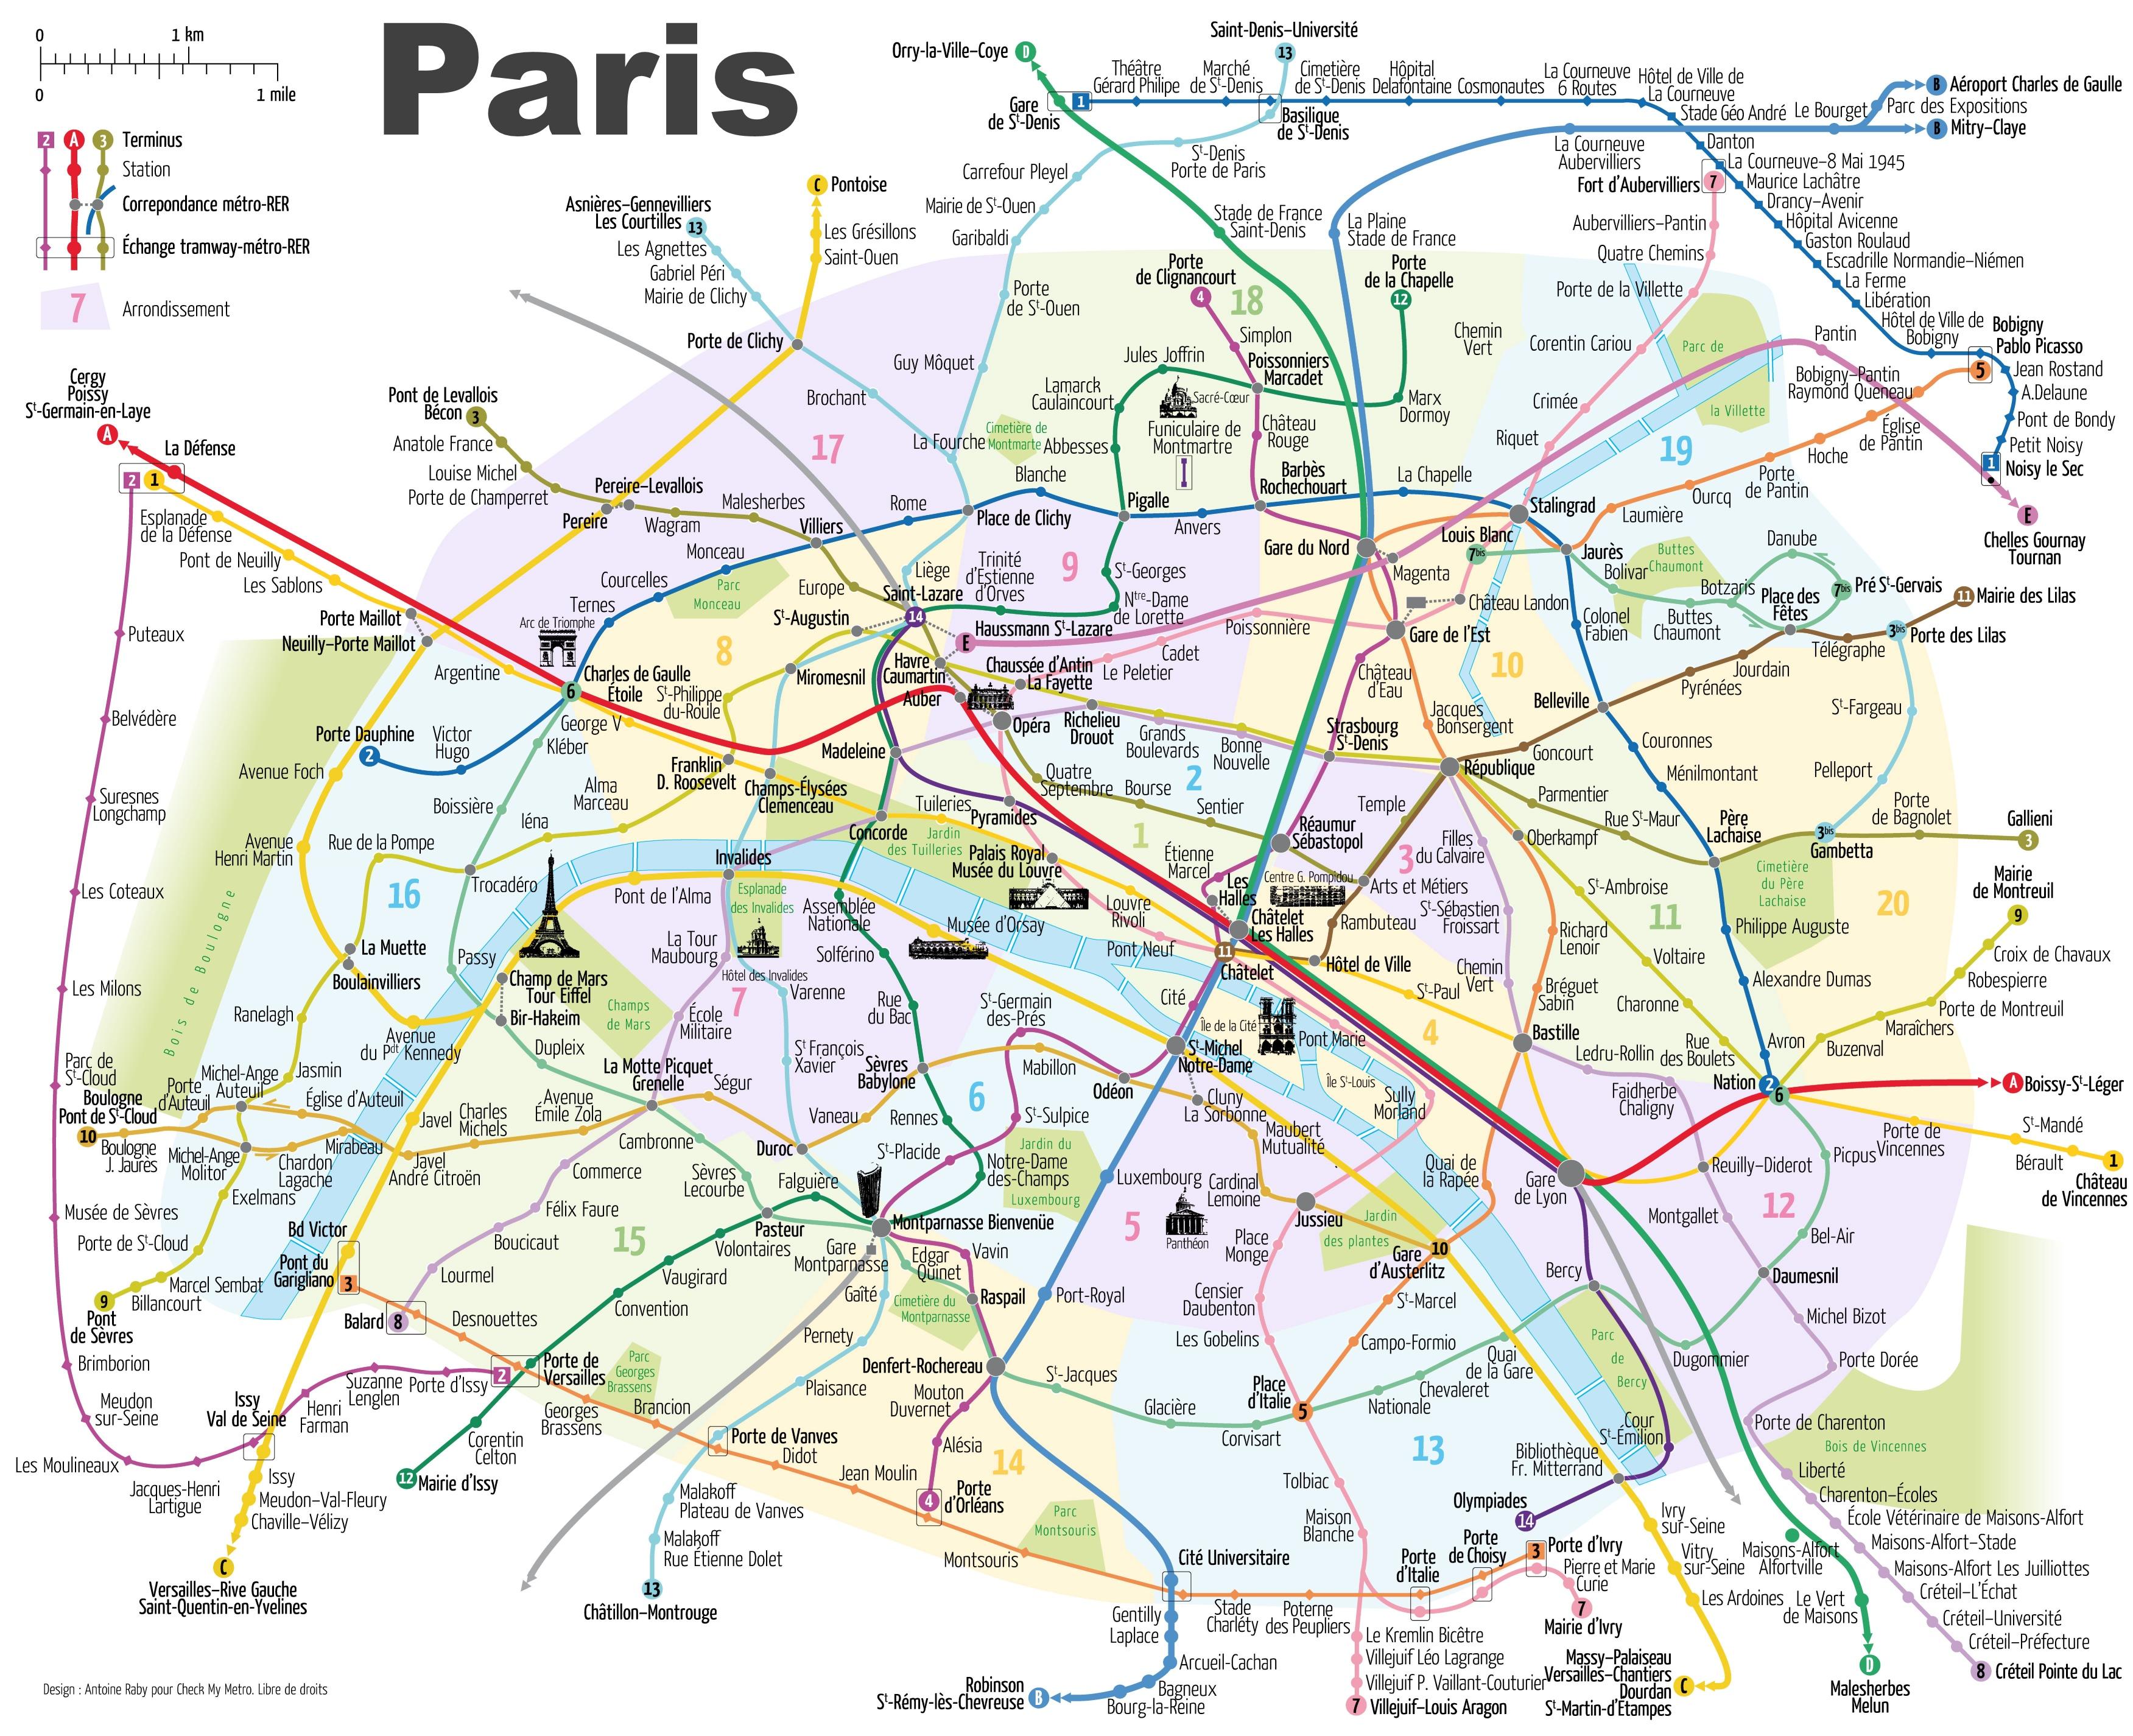 Map Of Paris France Paris metro map with main tourist attractions Map Of Paris France